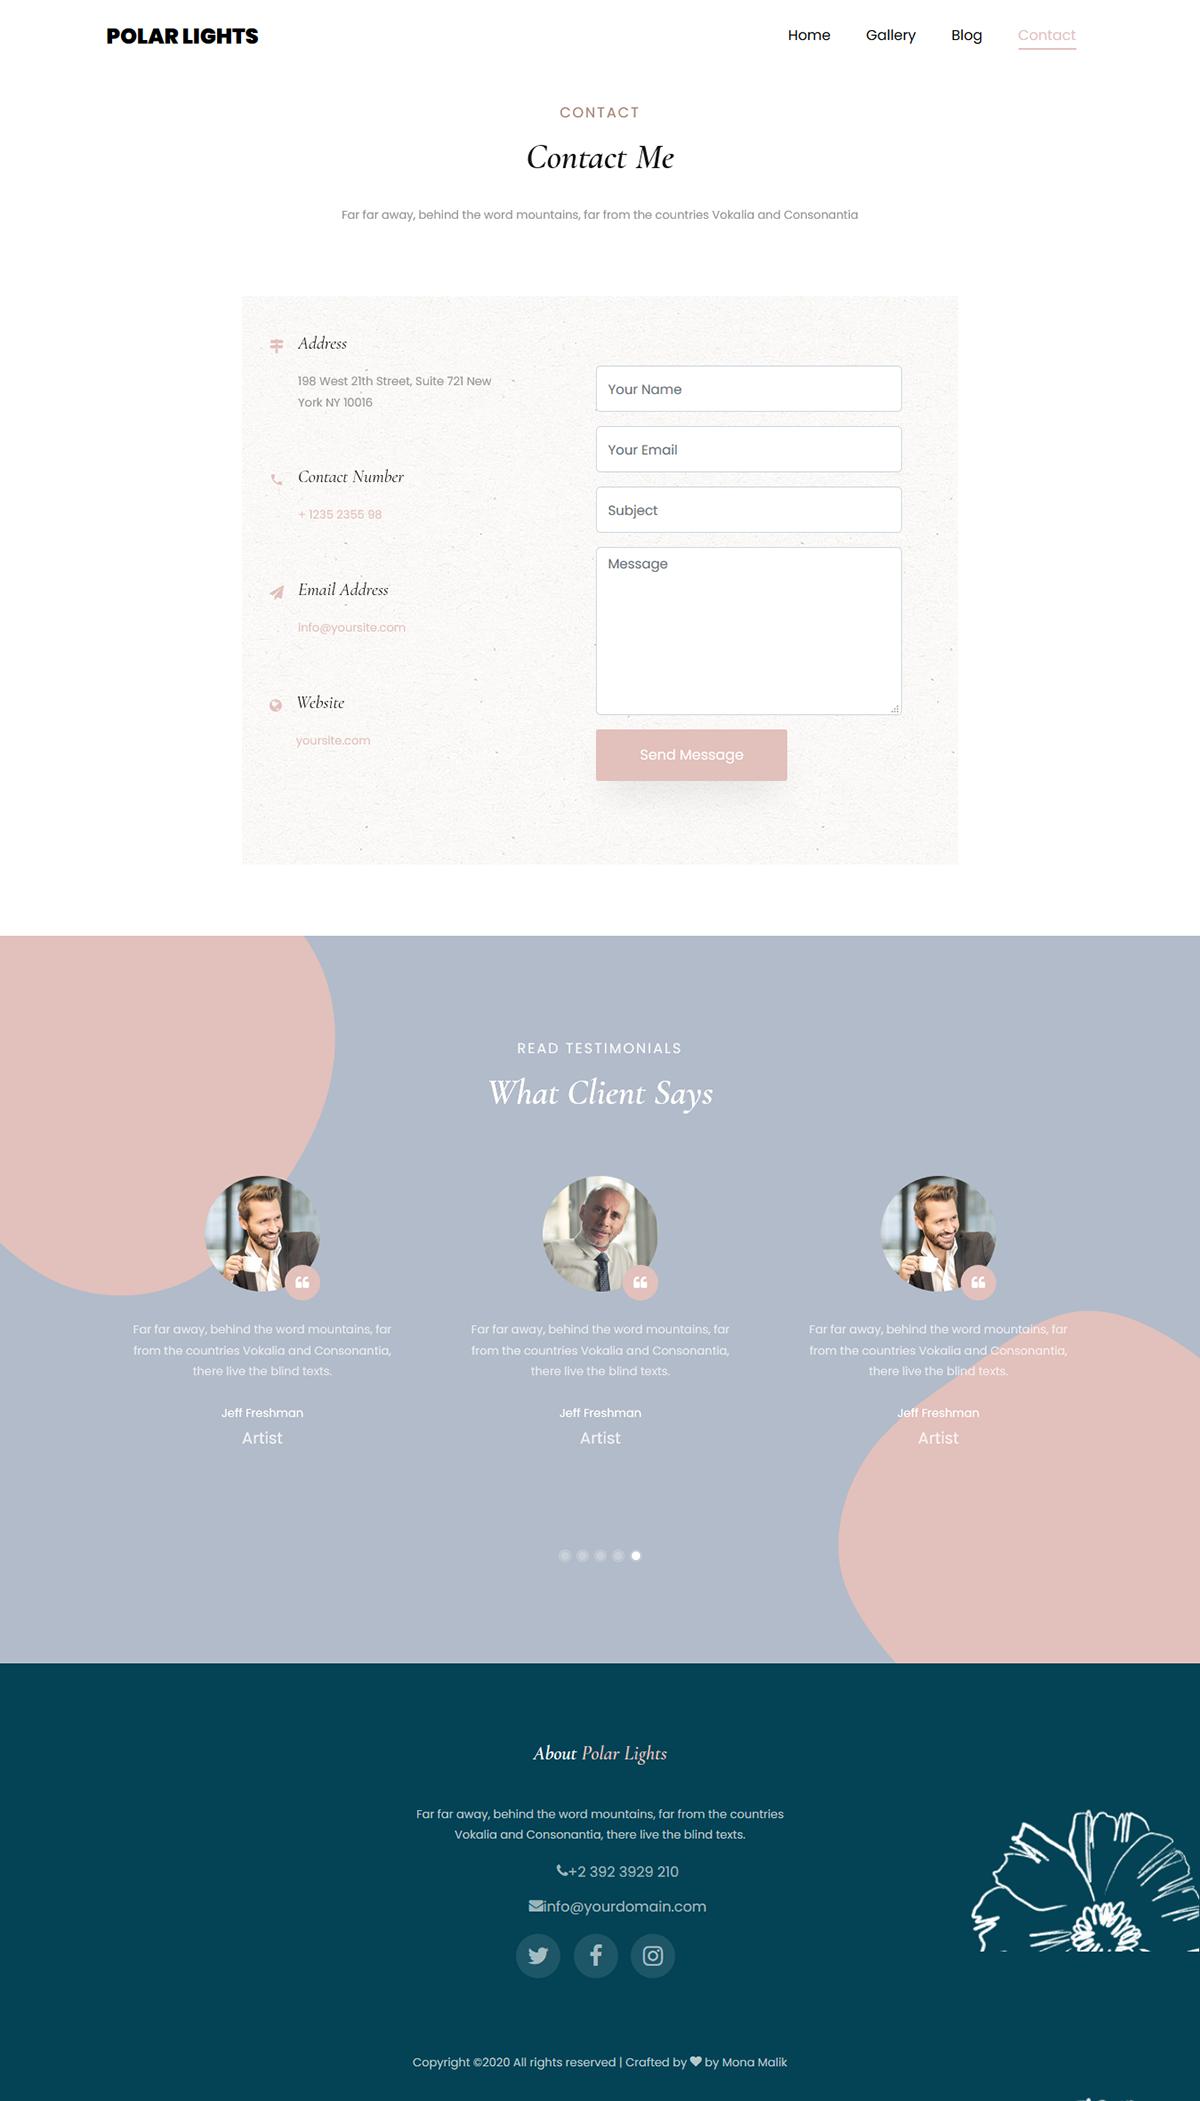 bootstrap monawebdeveloper polar lights Responsive Web Design  Website